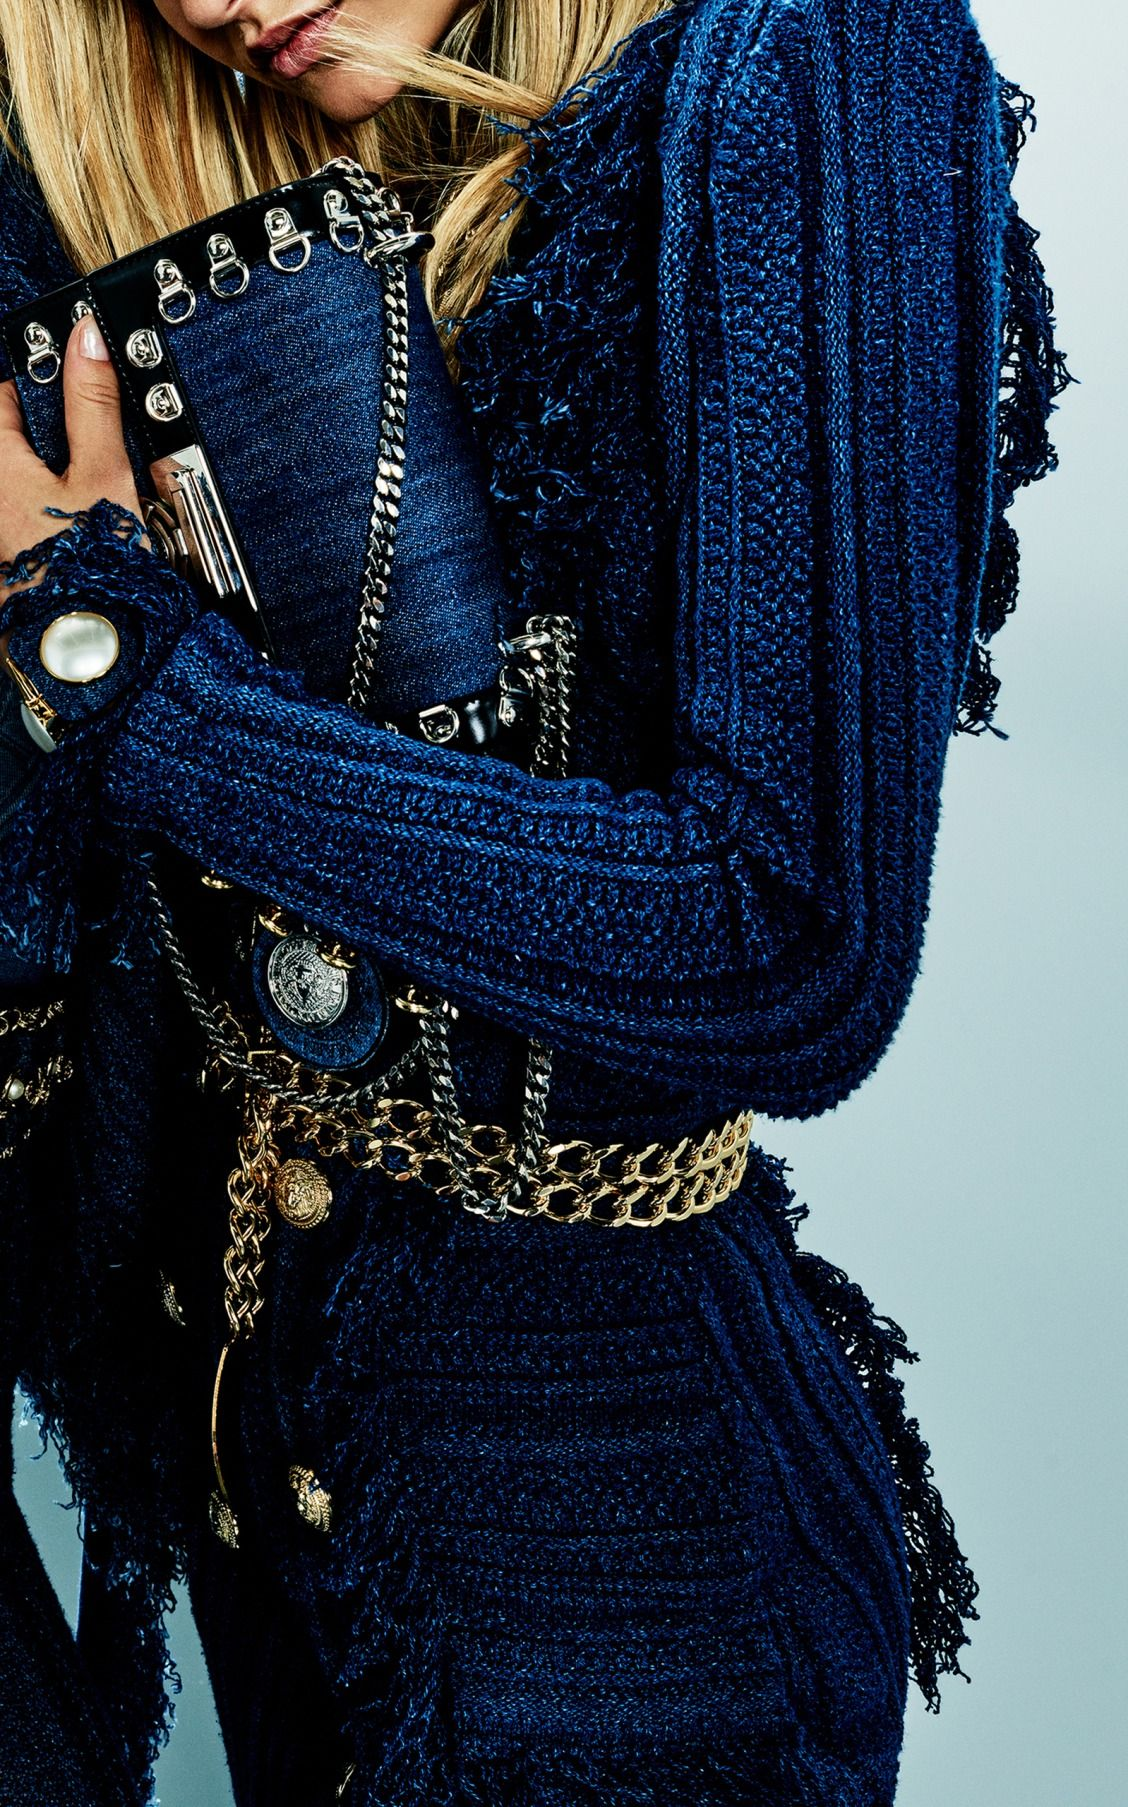 cdece3a56ae4 Denim Tweed Blazer Dress by Balmain | M'Odette Obsessions in 2019 ...